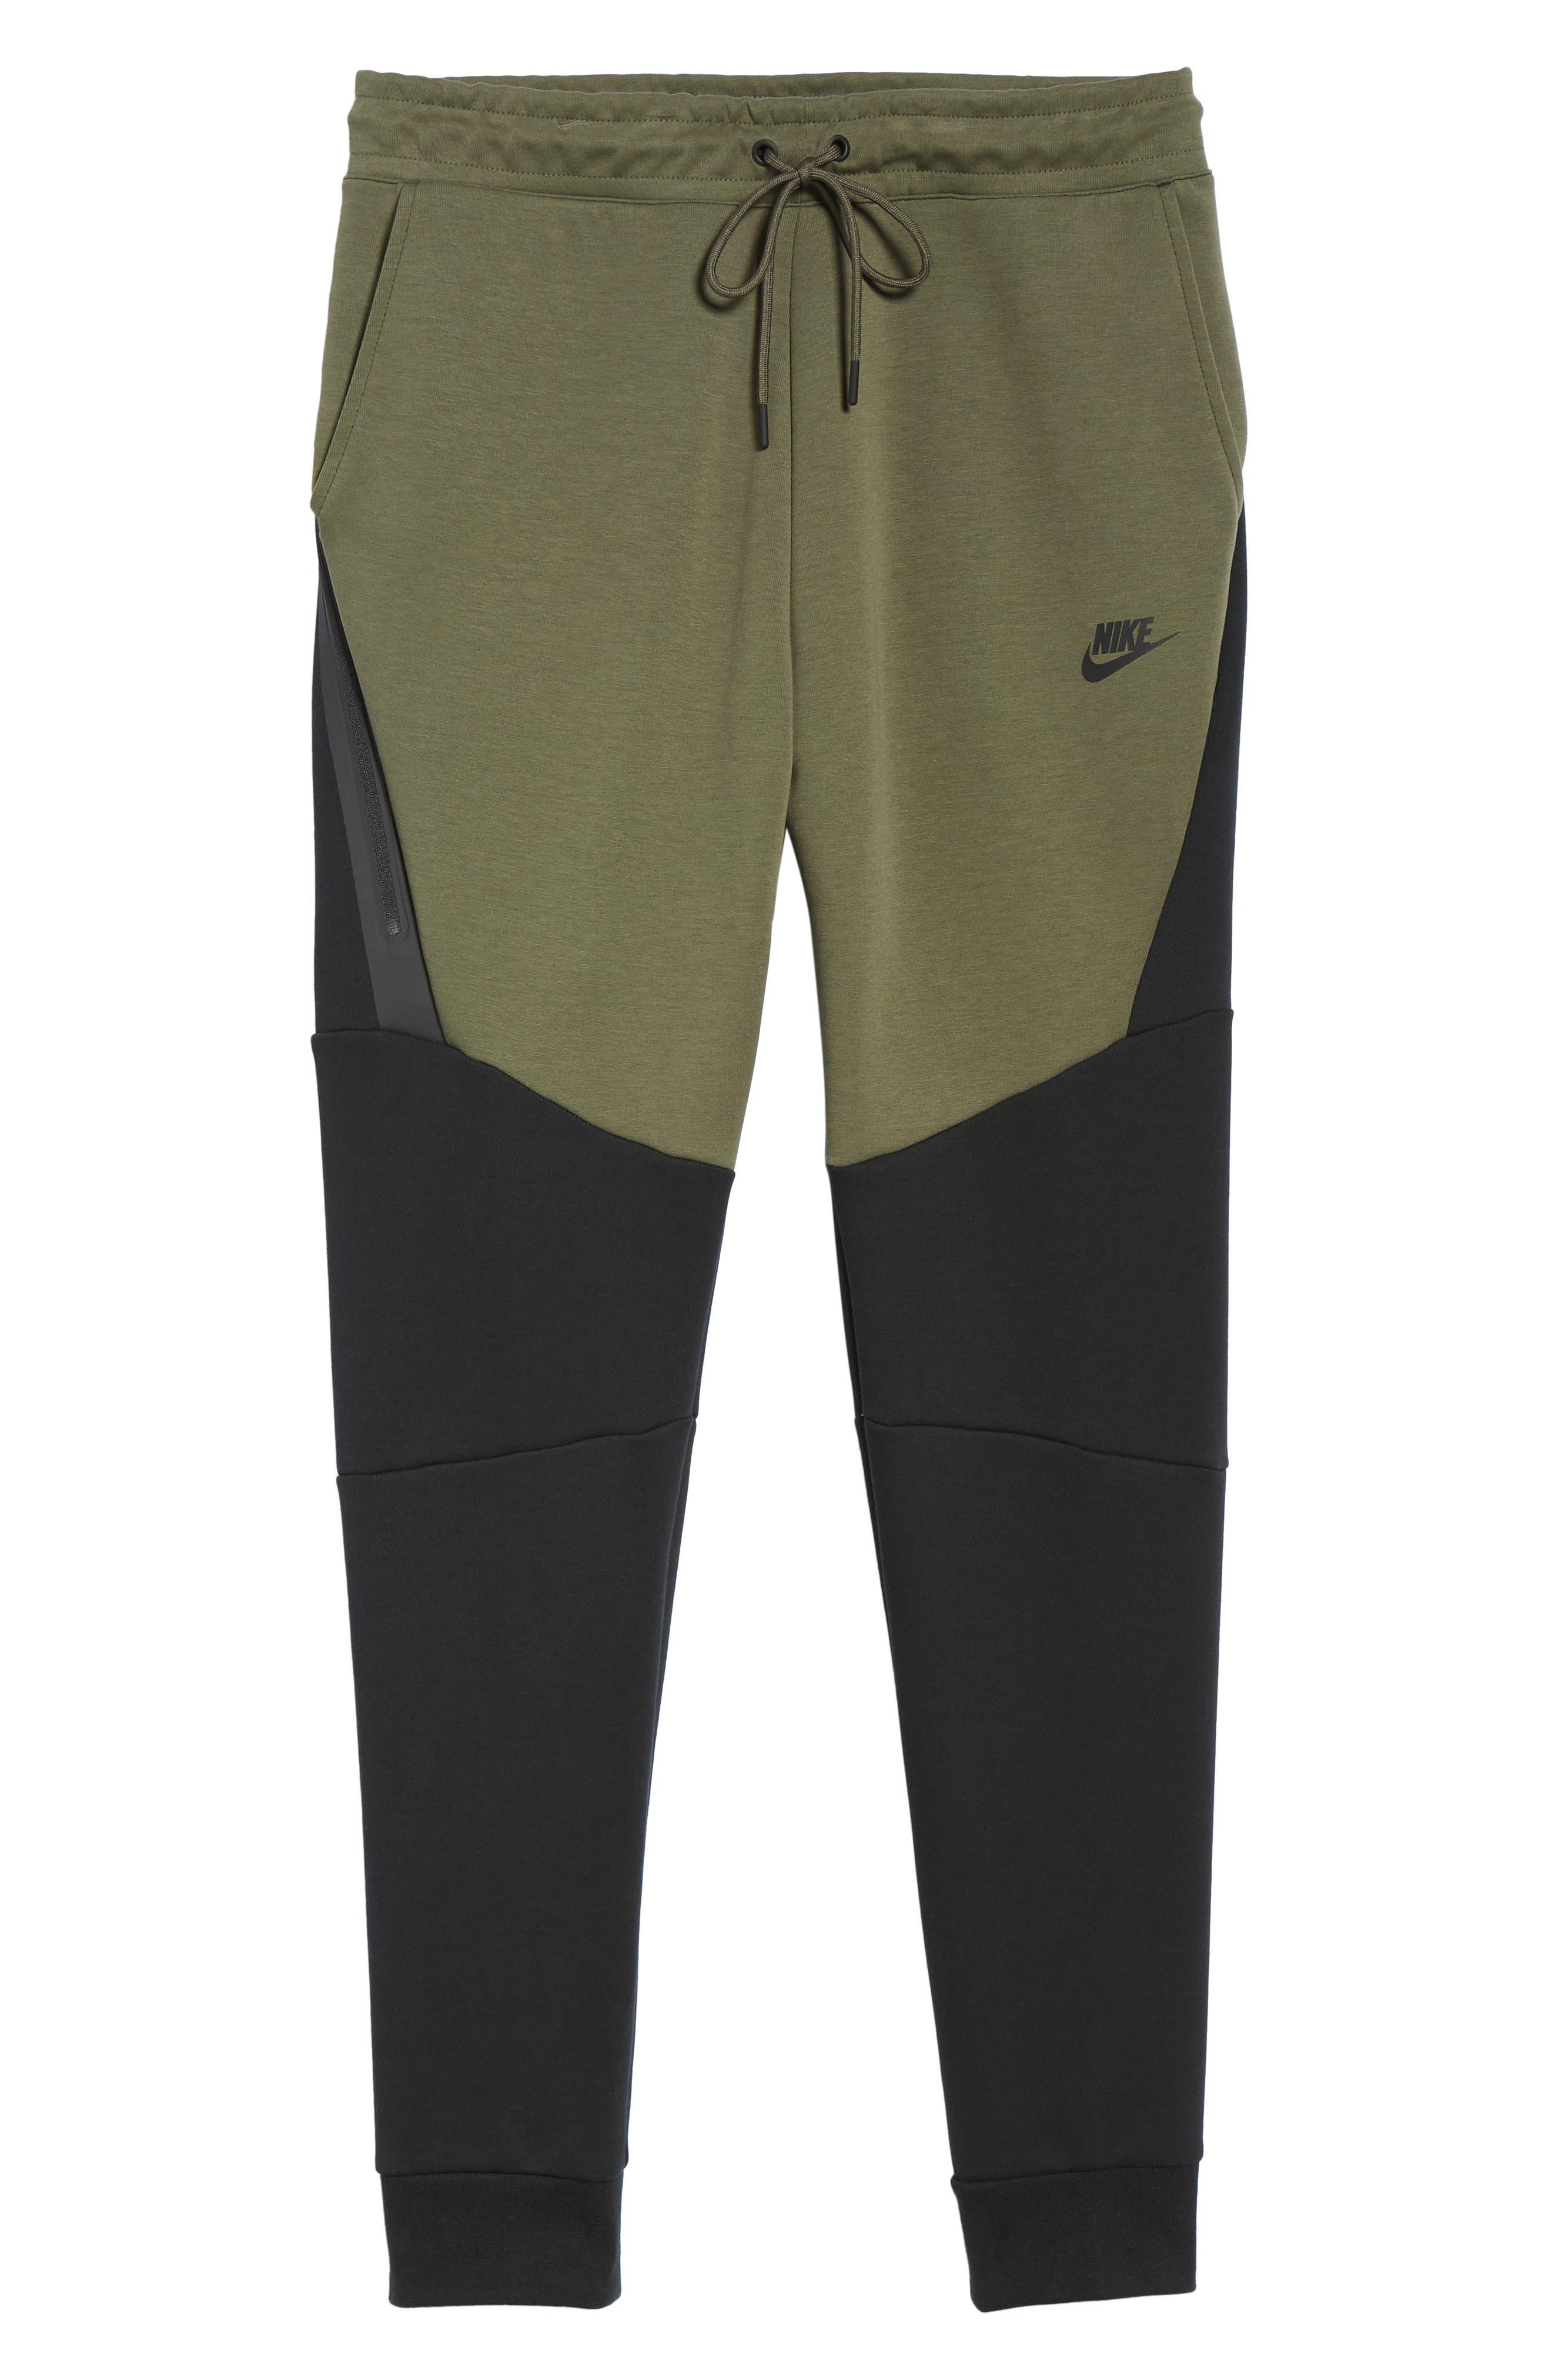 Tech Fleece Jogger Pants,                             Alternate thumbnail 6, color,                             BLACK/ TWILIGHT MARSH/ BLACK